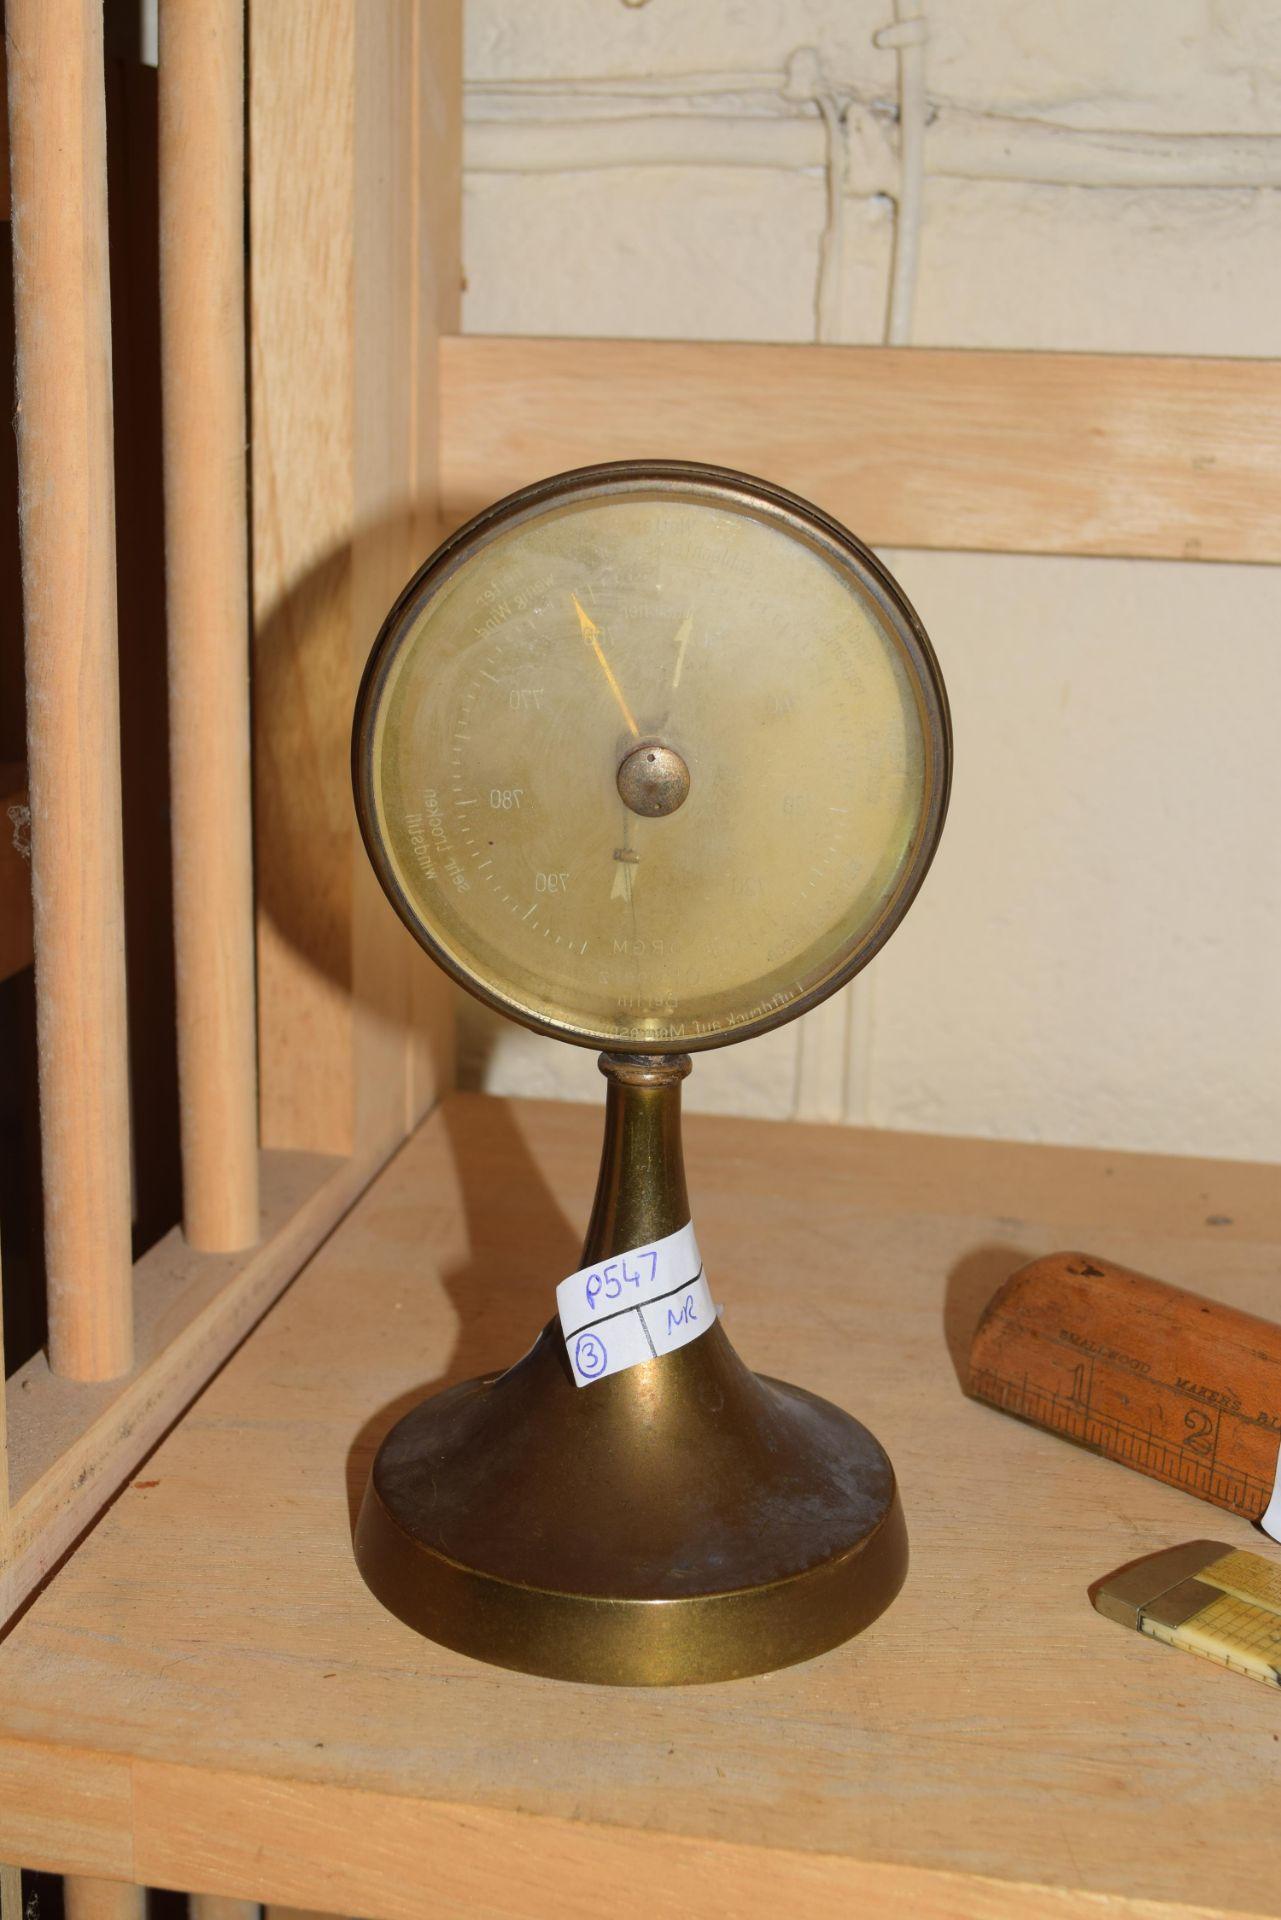 C P Goerz Berlin, early 20th century brass mounted desk barometer, 17cm high - Image 2 of 4